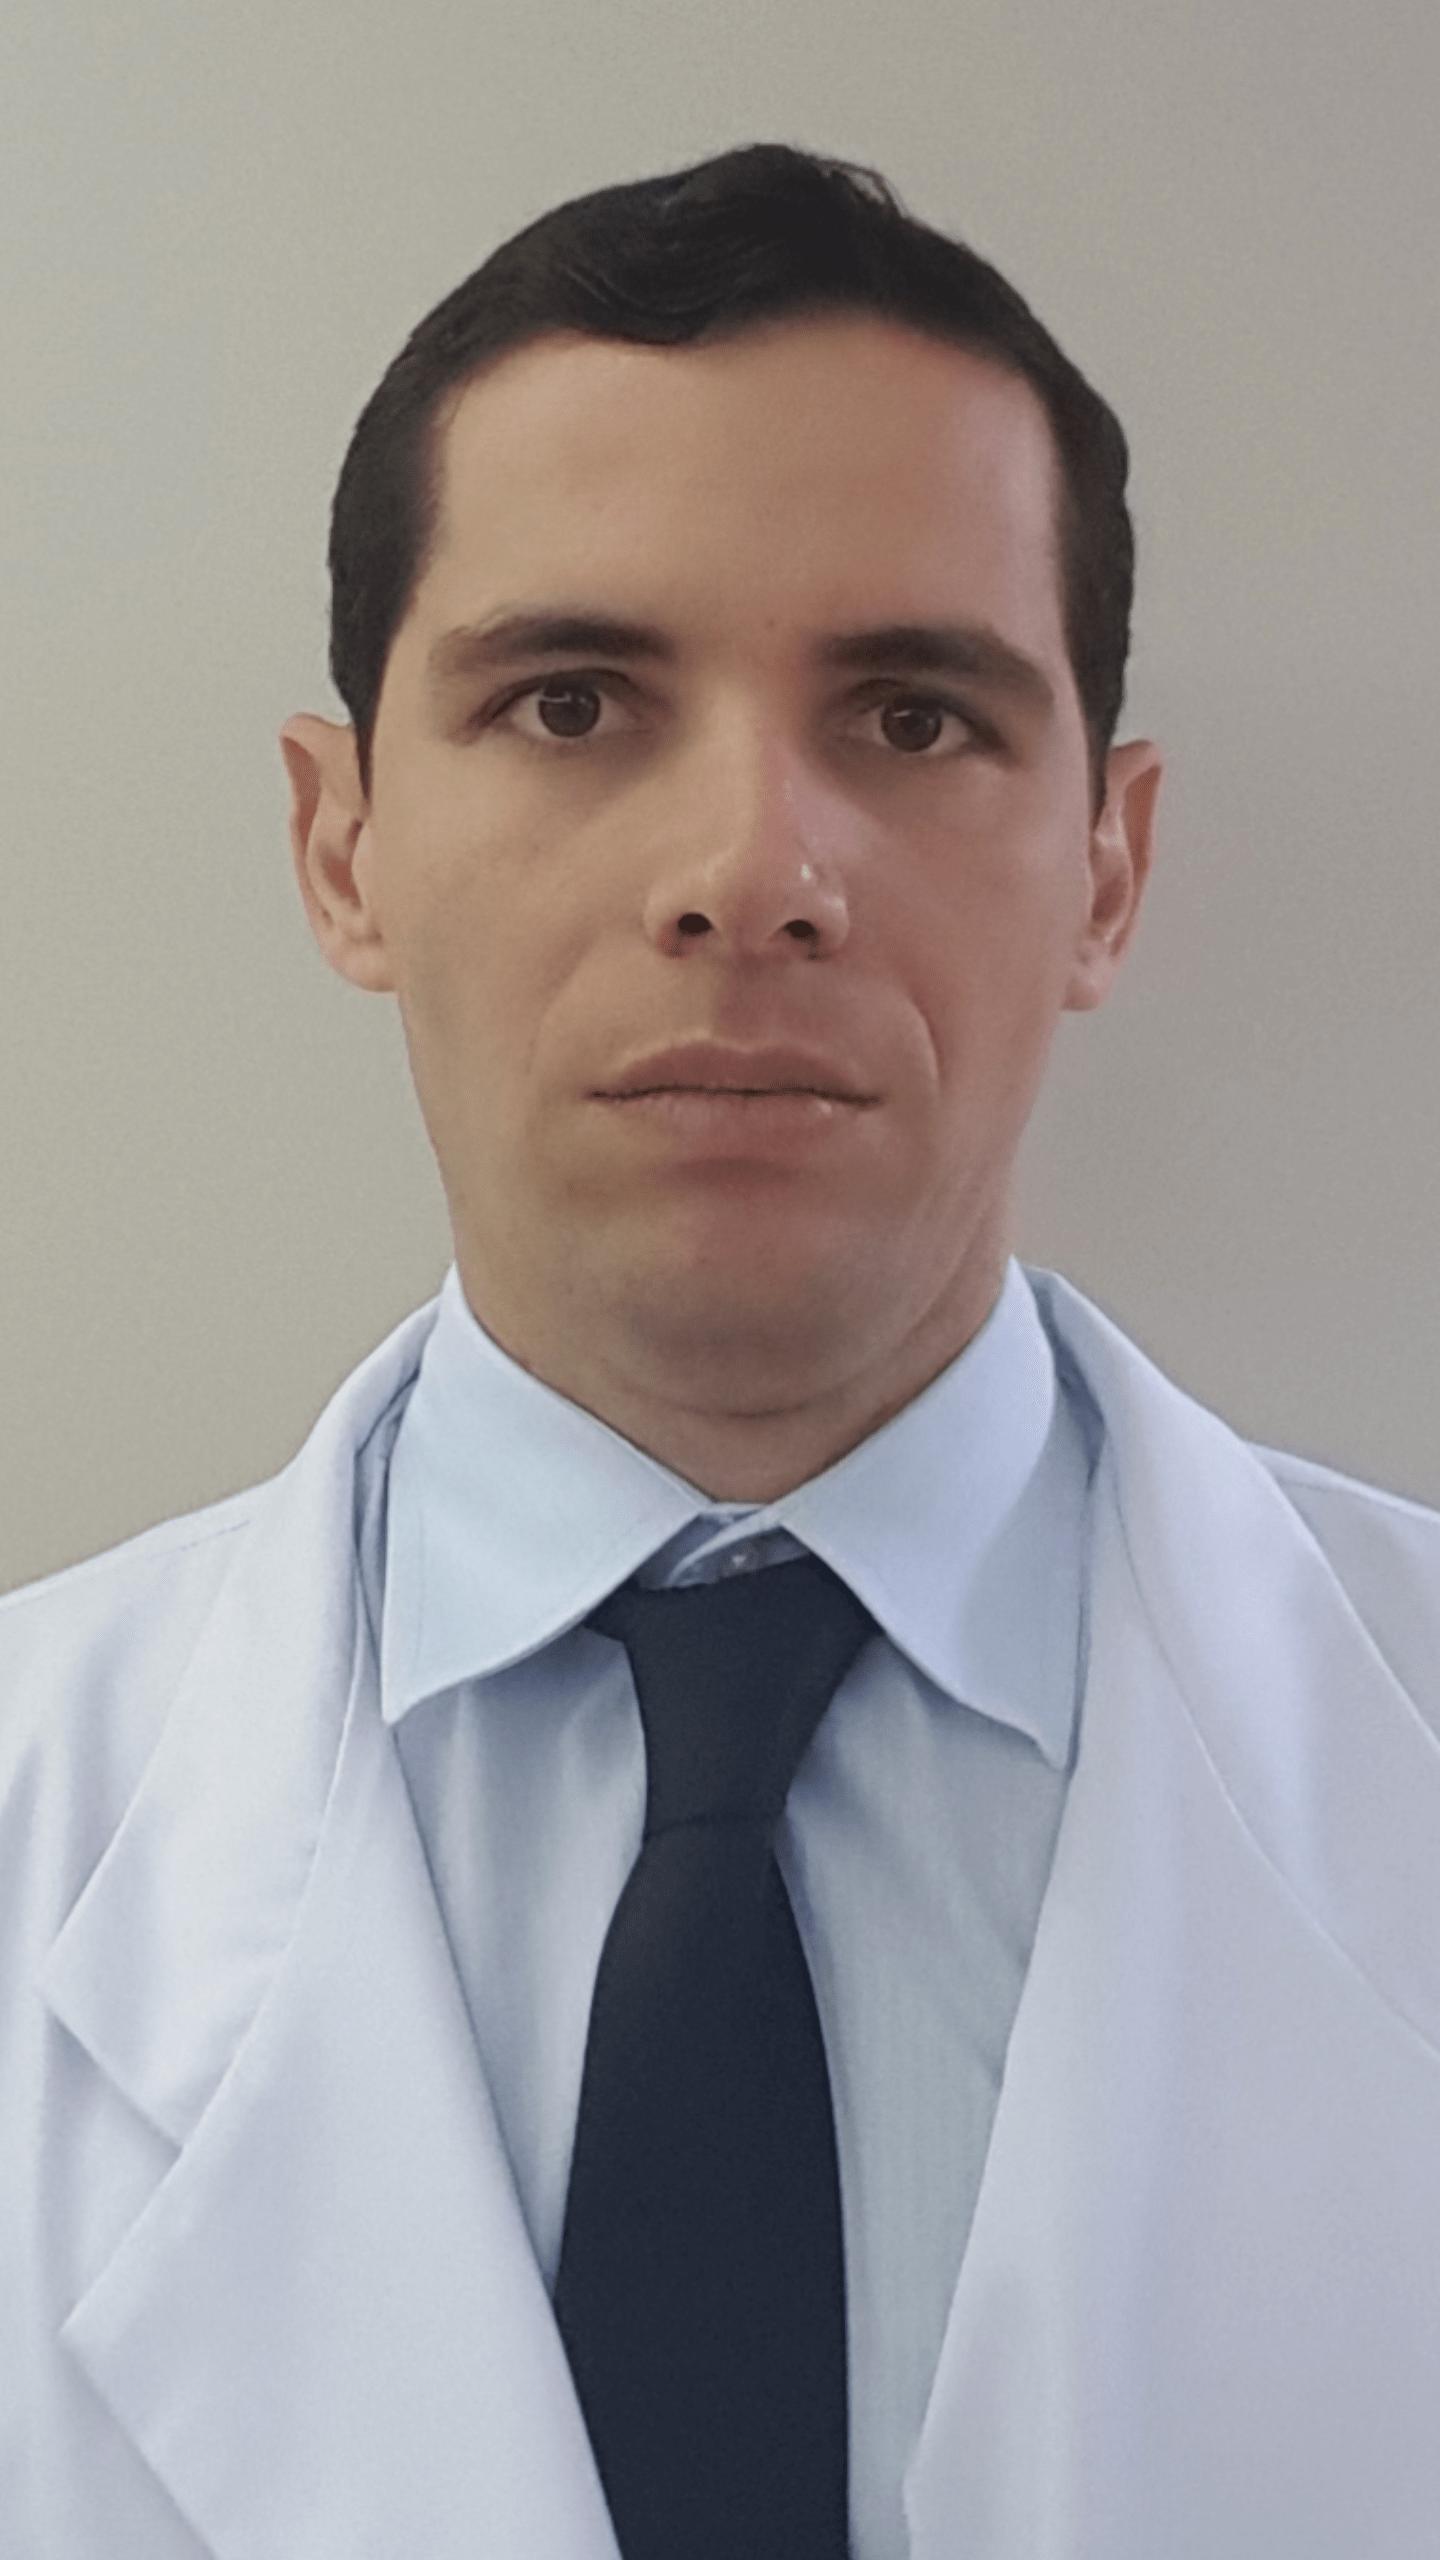 Andrei Fernandes Joaquim